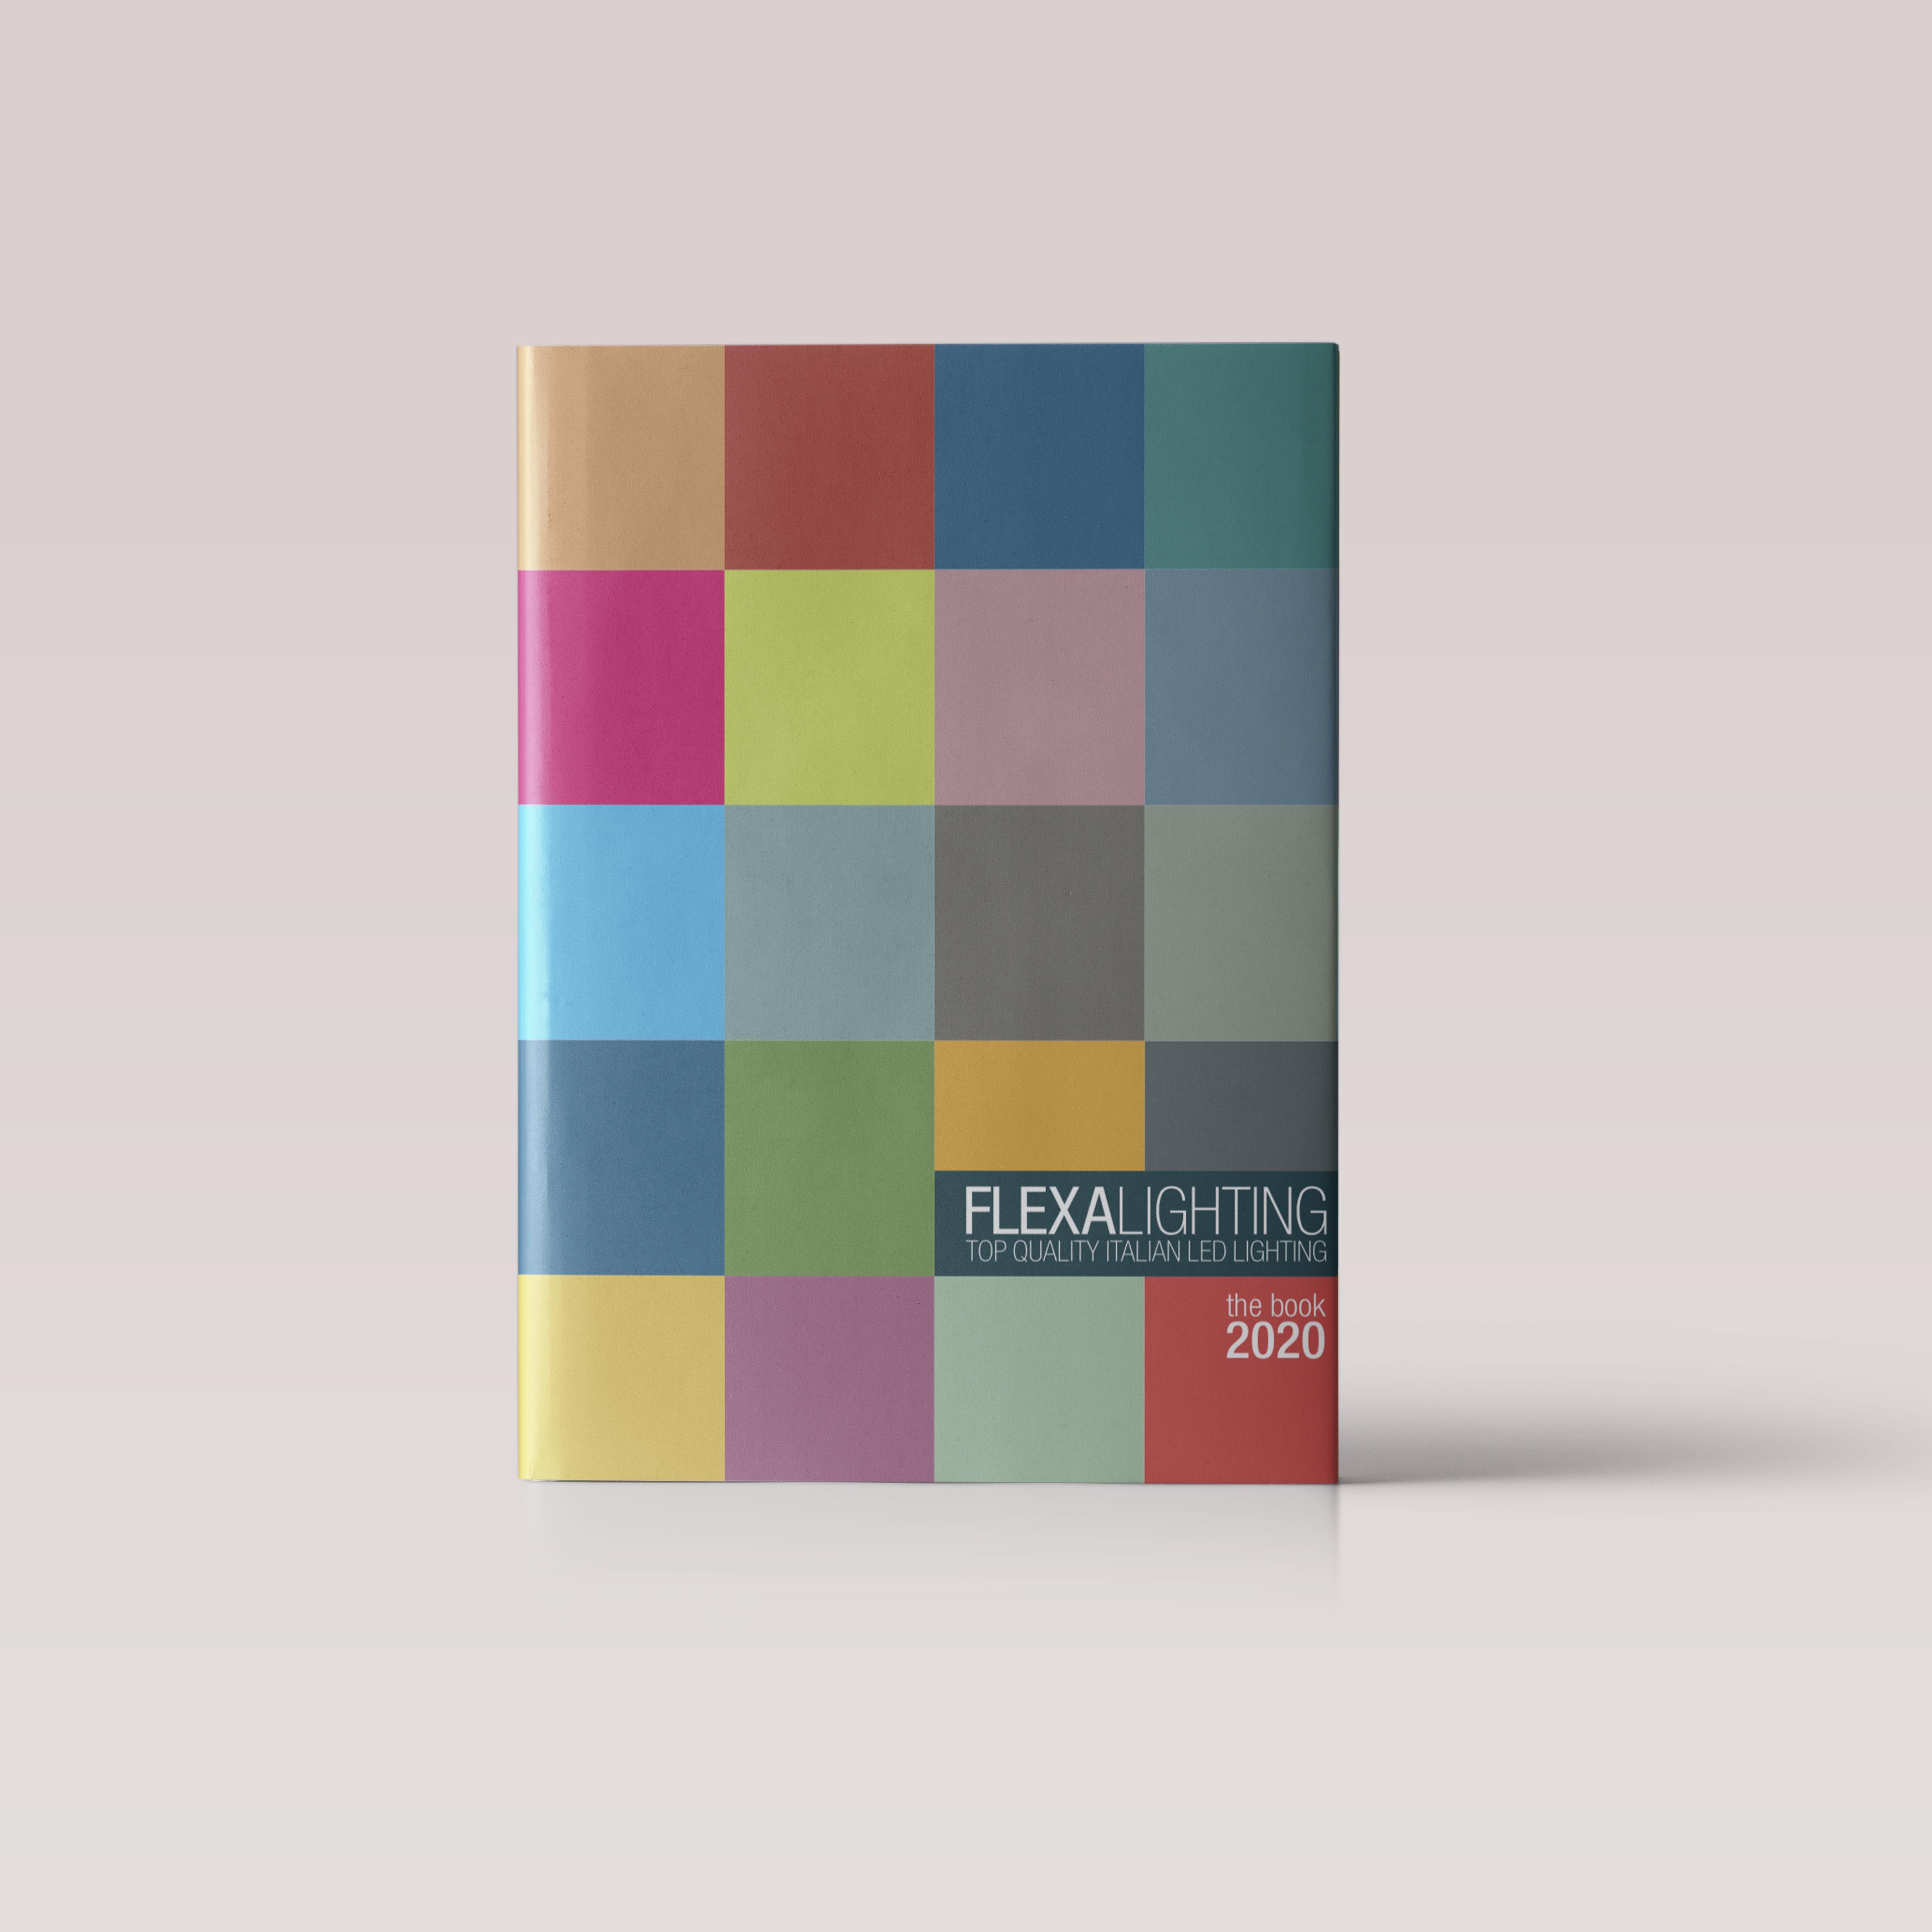 Catálogo Flexalighting The Book 2020